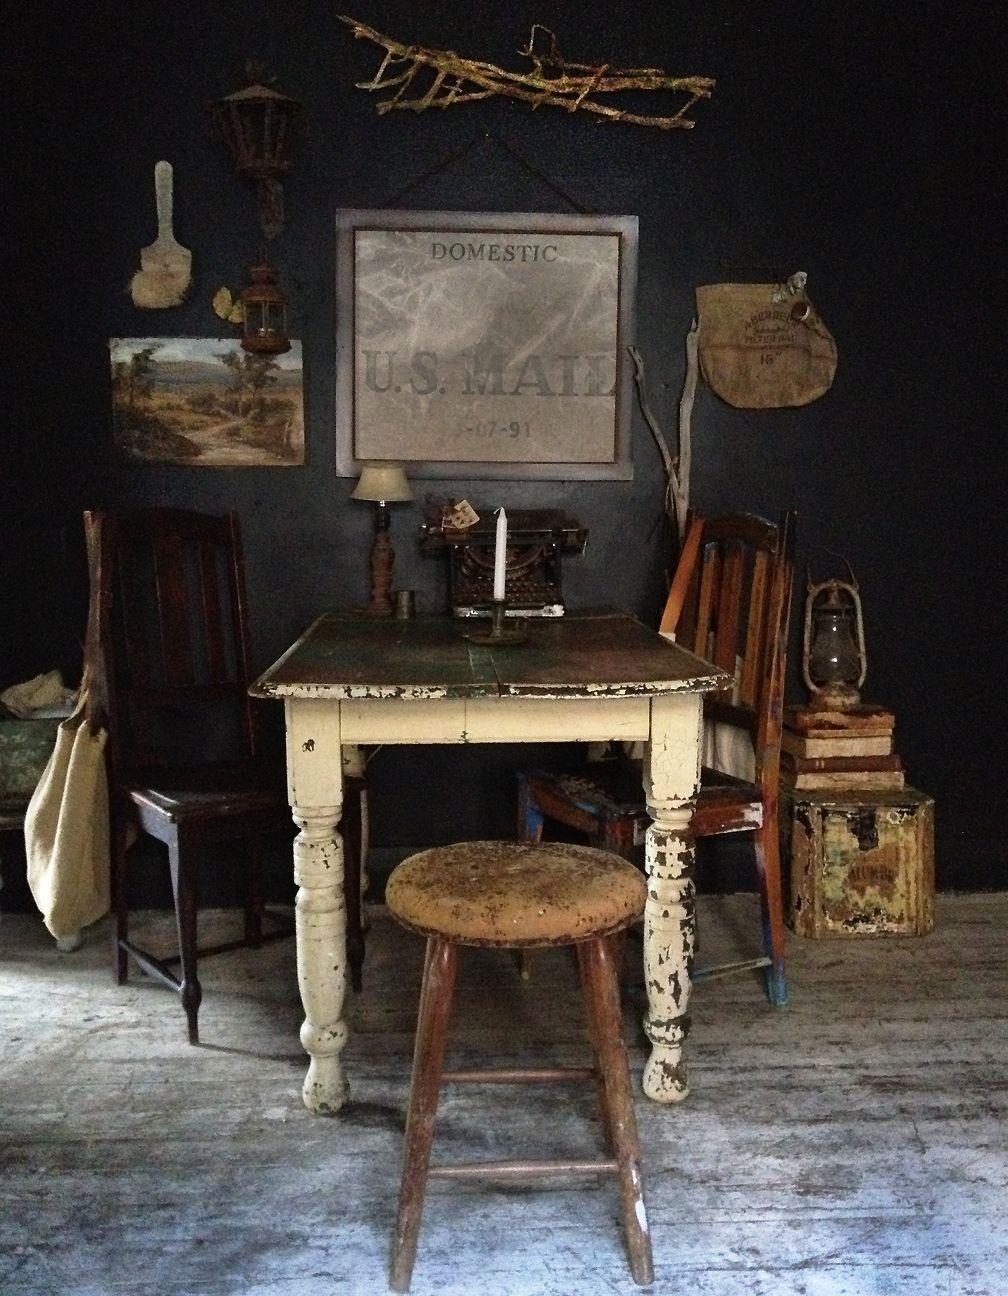 Hotels with a Macabre Past | Home decor, Decor, Macabre |Macabre Interiors